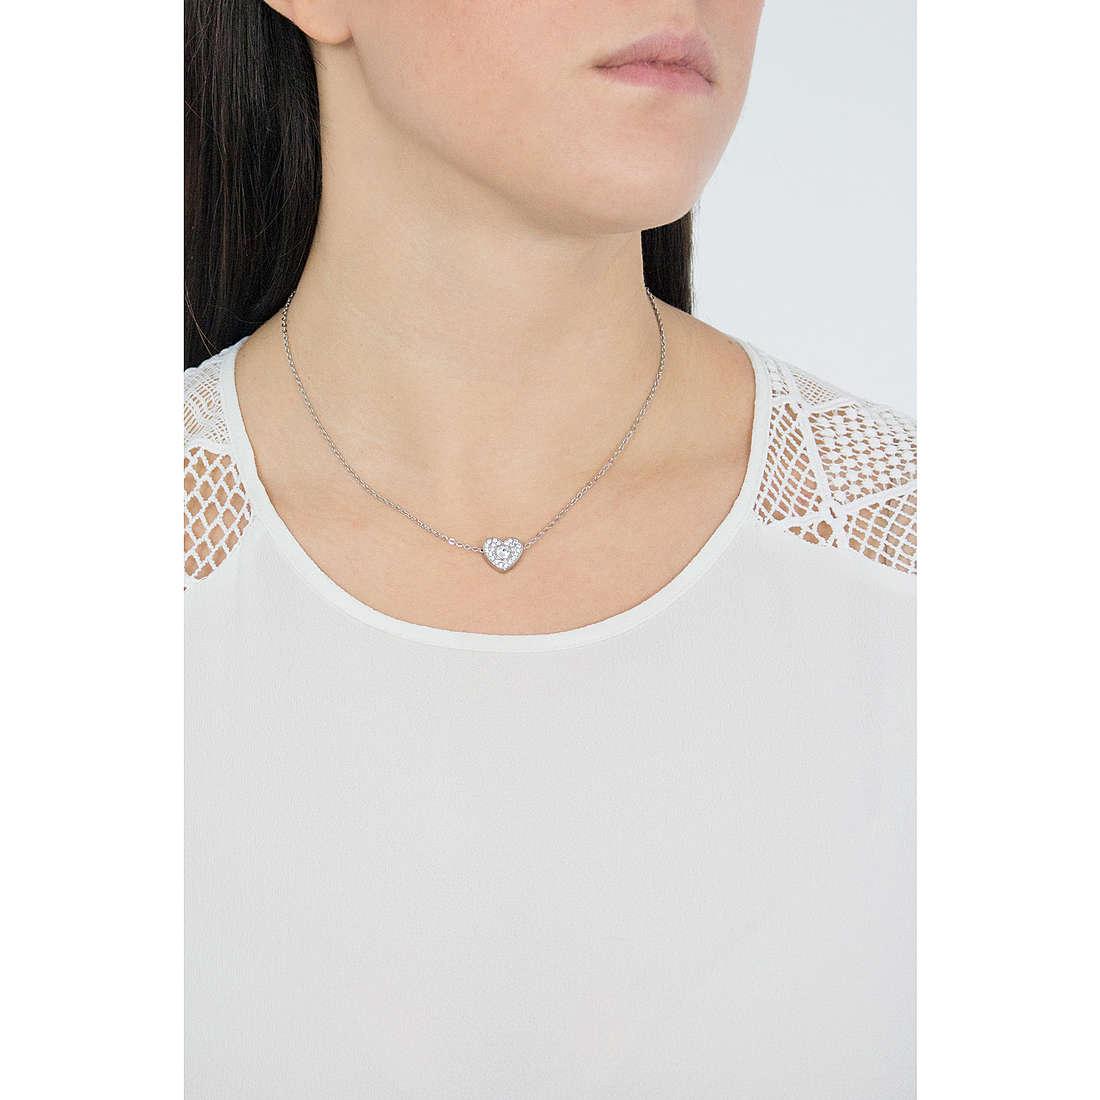 Brosway collane Epsilon donna BEO03 indosso